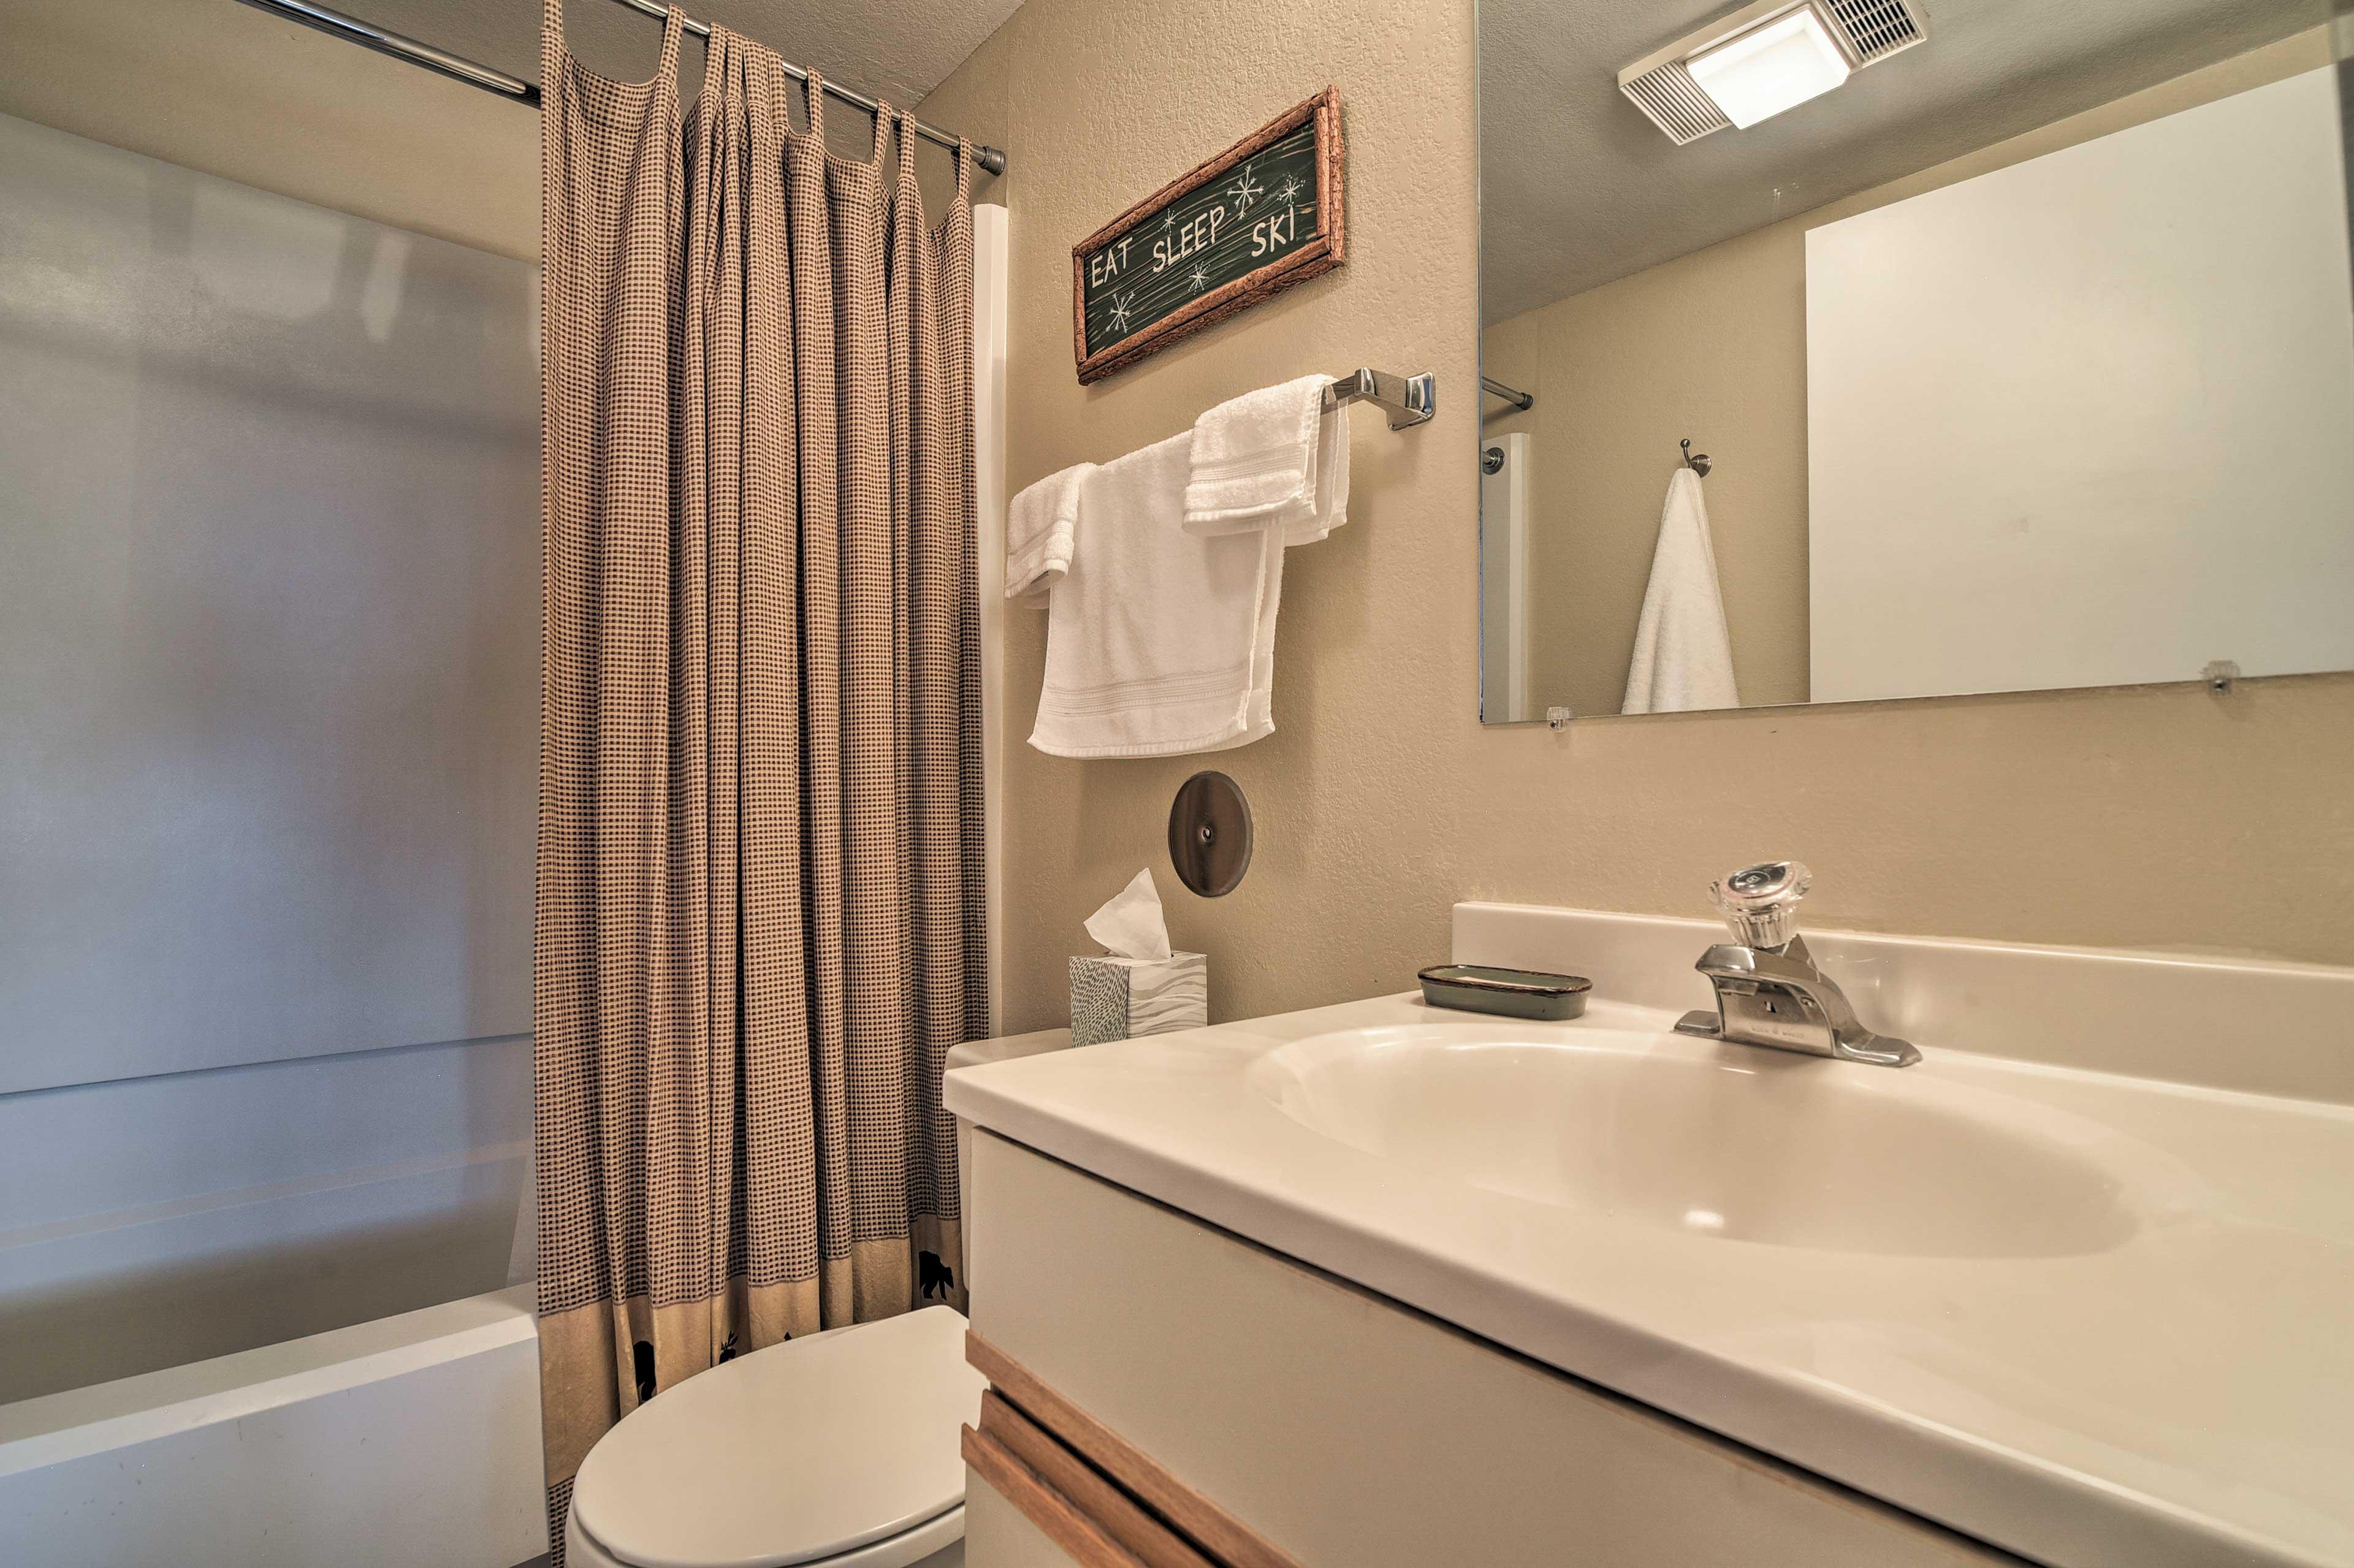 An en-suite bathroom adds convenience.